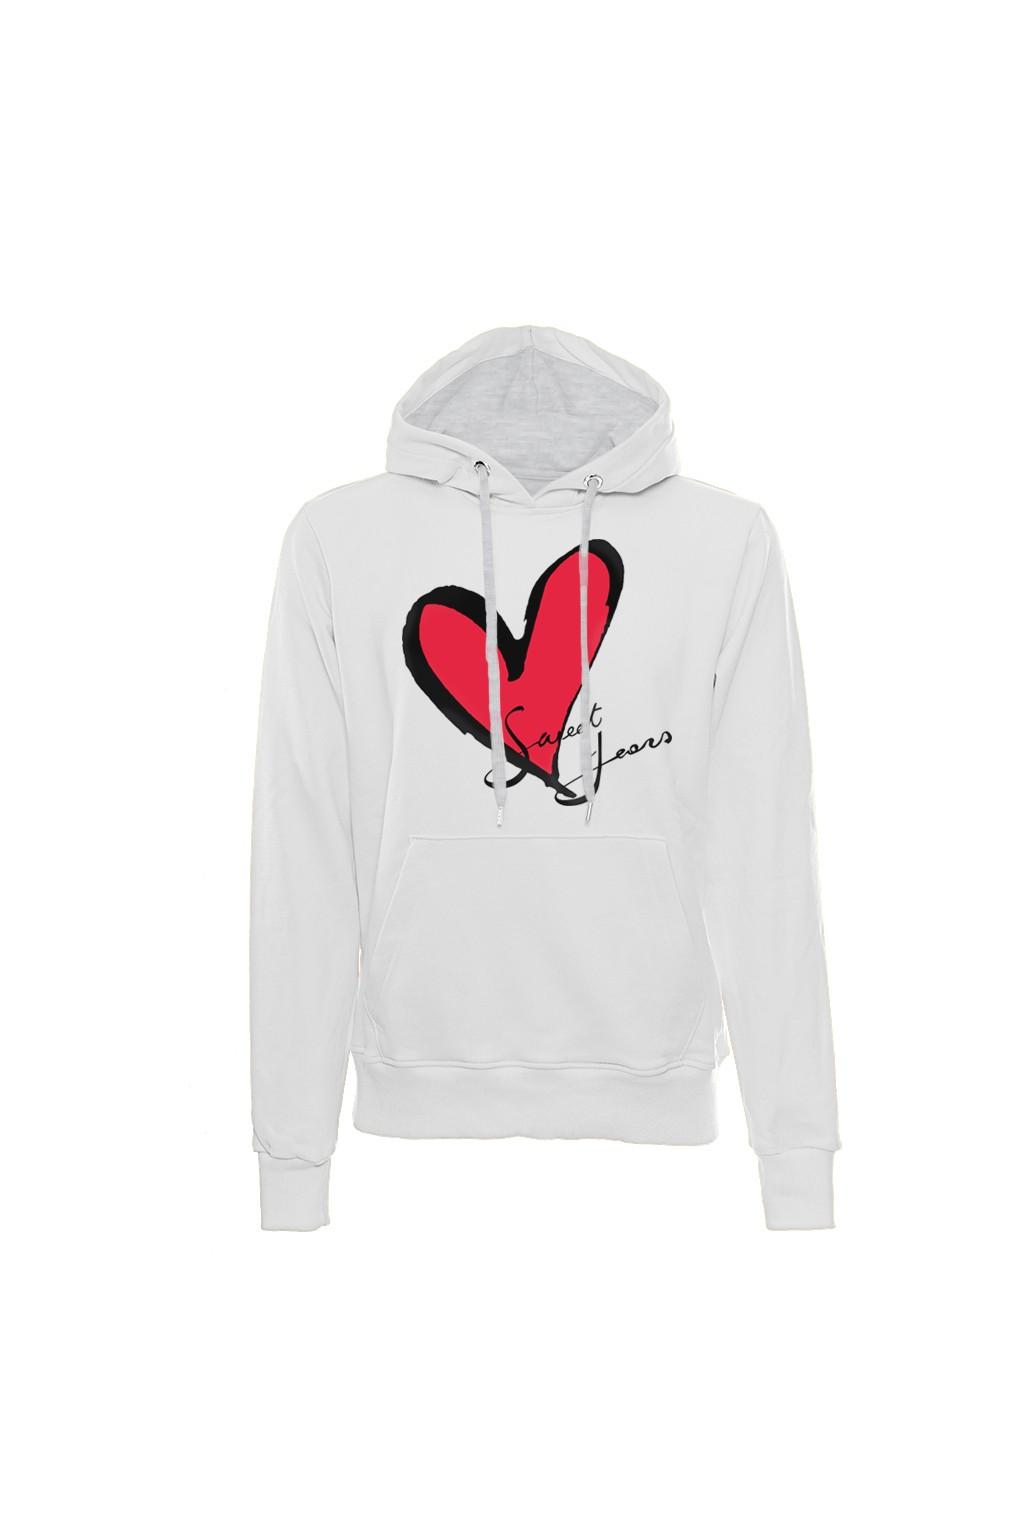 Felpa con cappuccio bianca in cotone con logo del cuore Sweet Years.